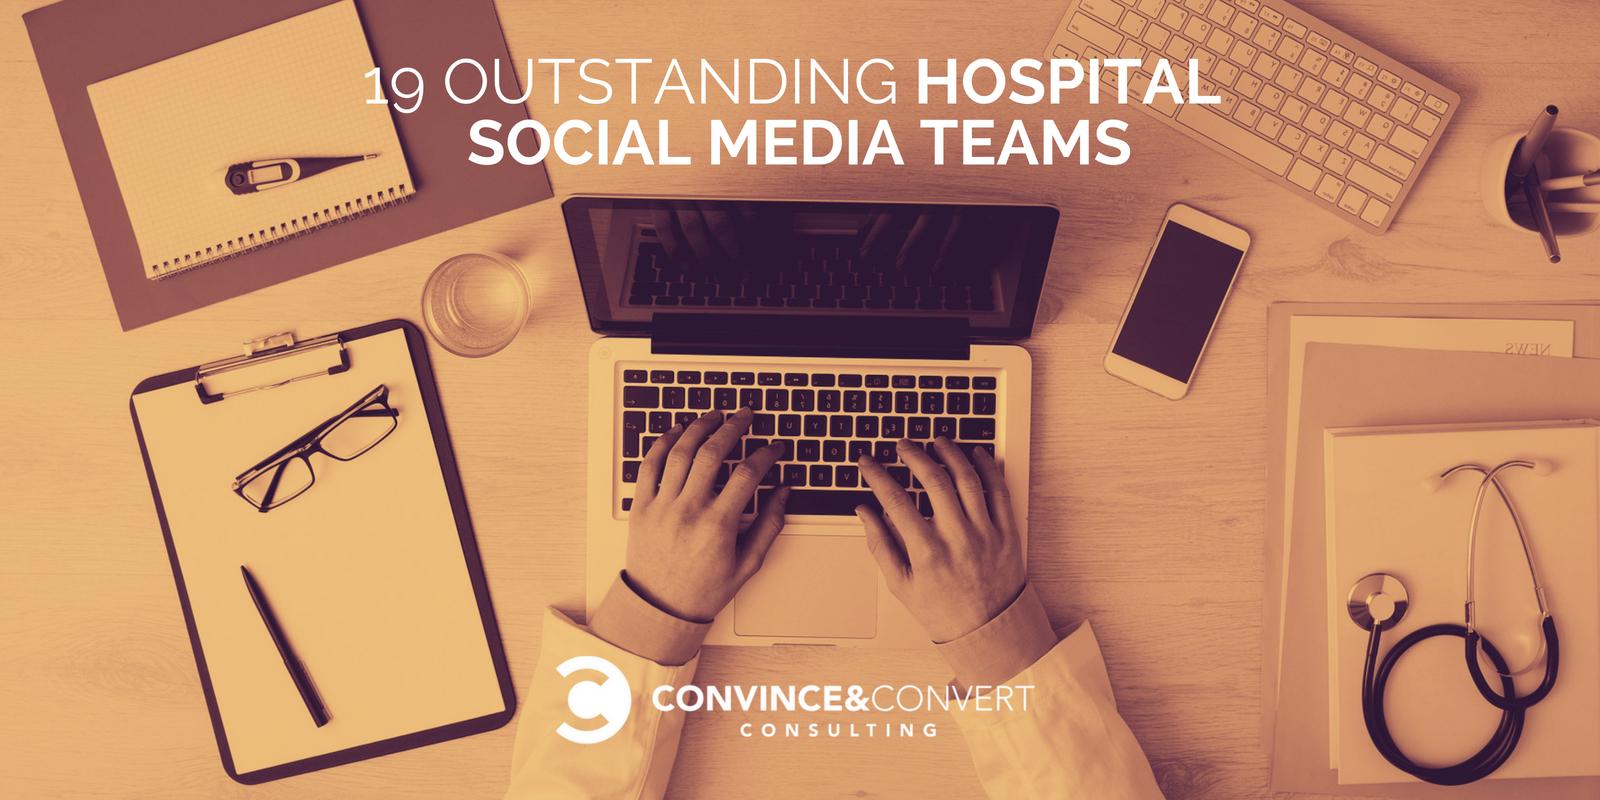 19 Outstanding Hospital Social Media Teams